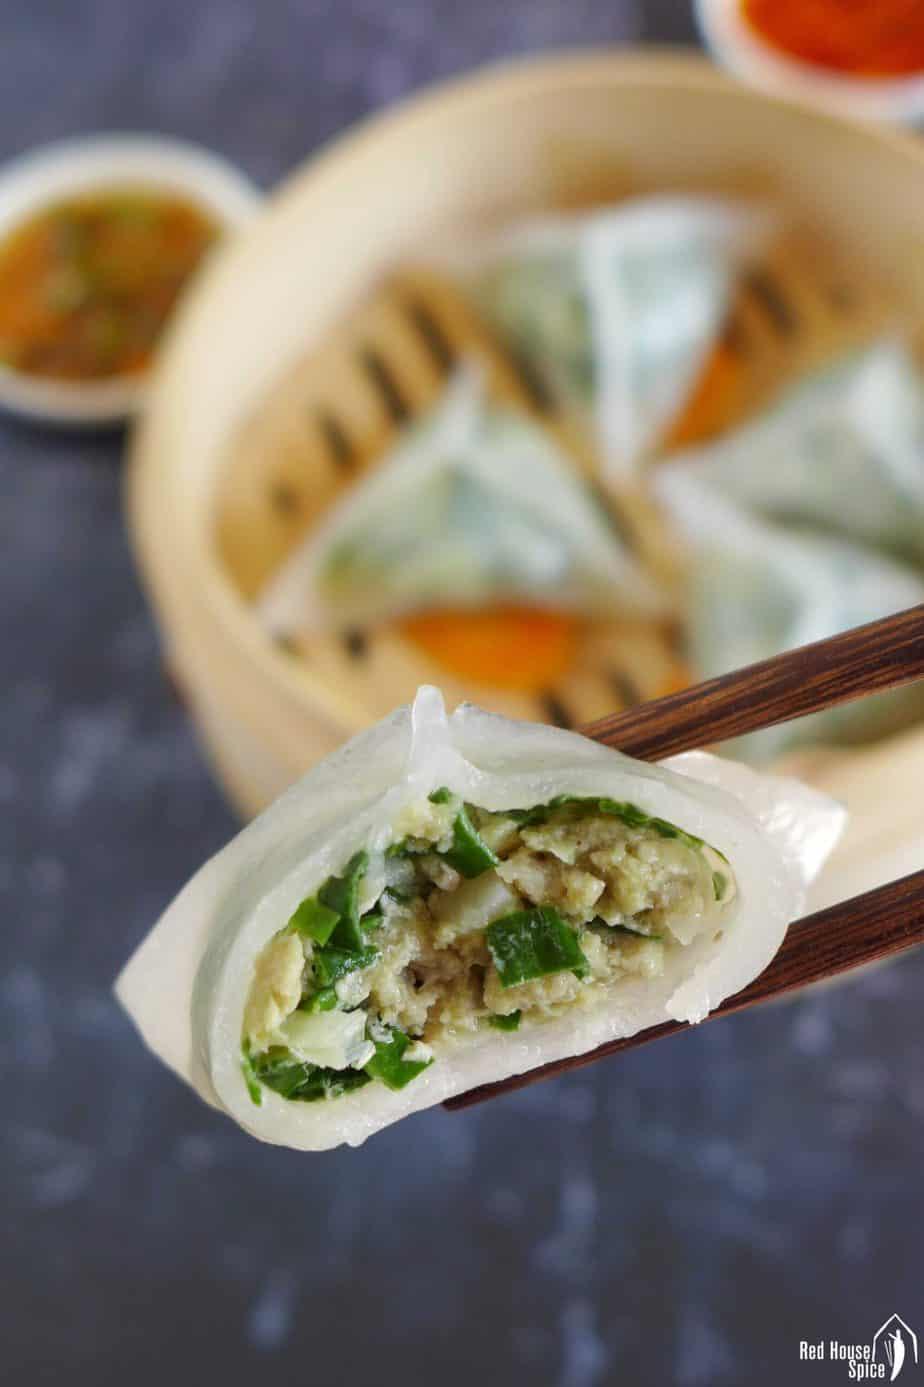 A half eaten crystal dumpling